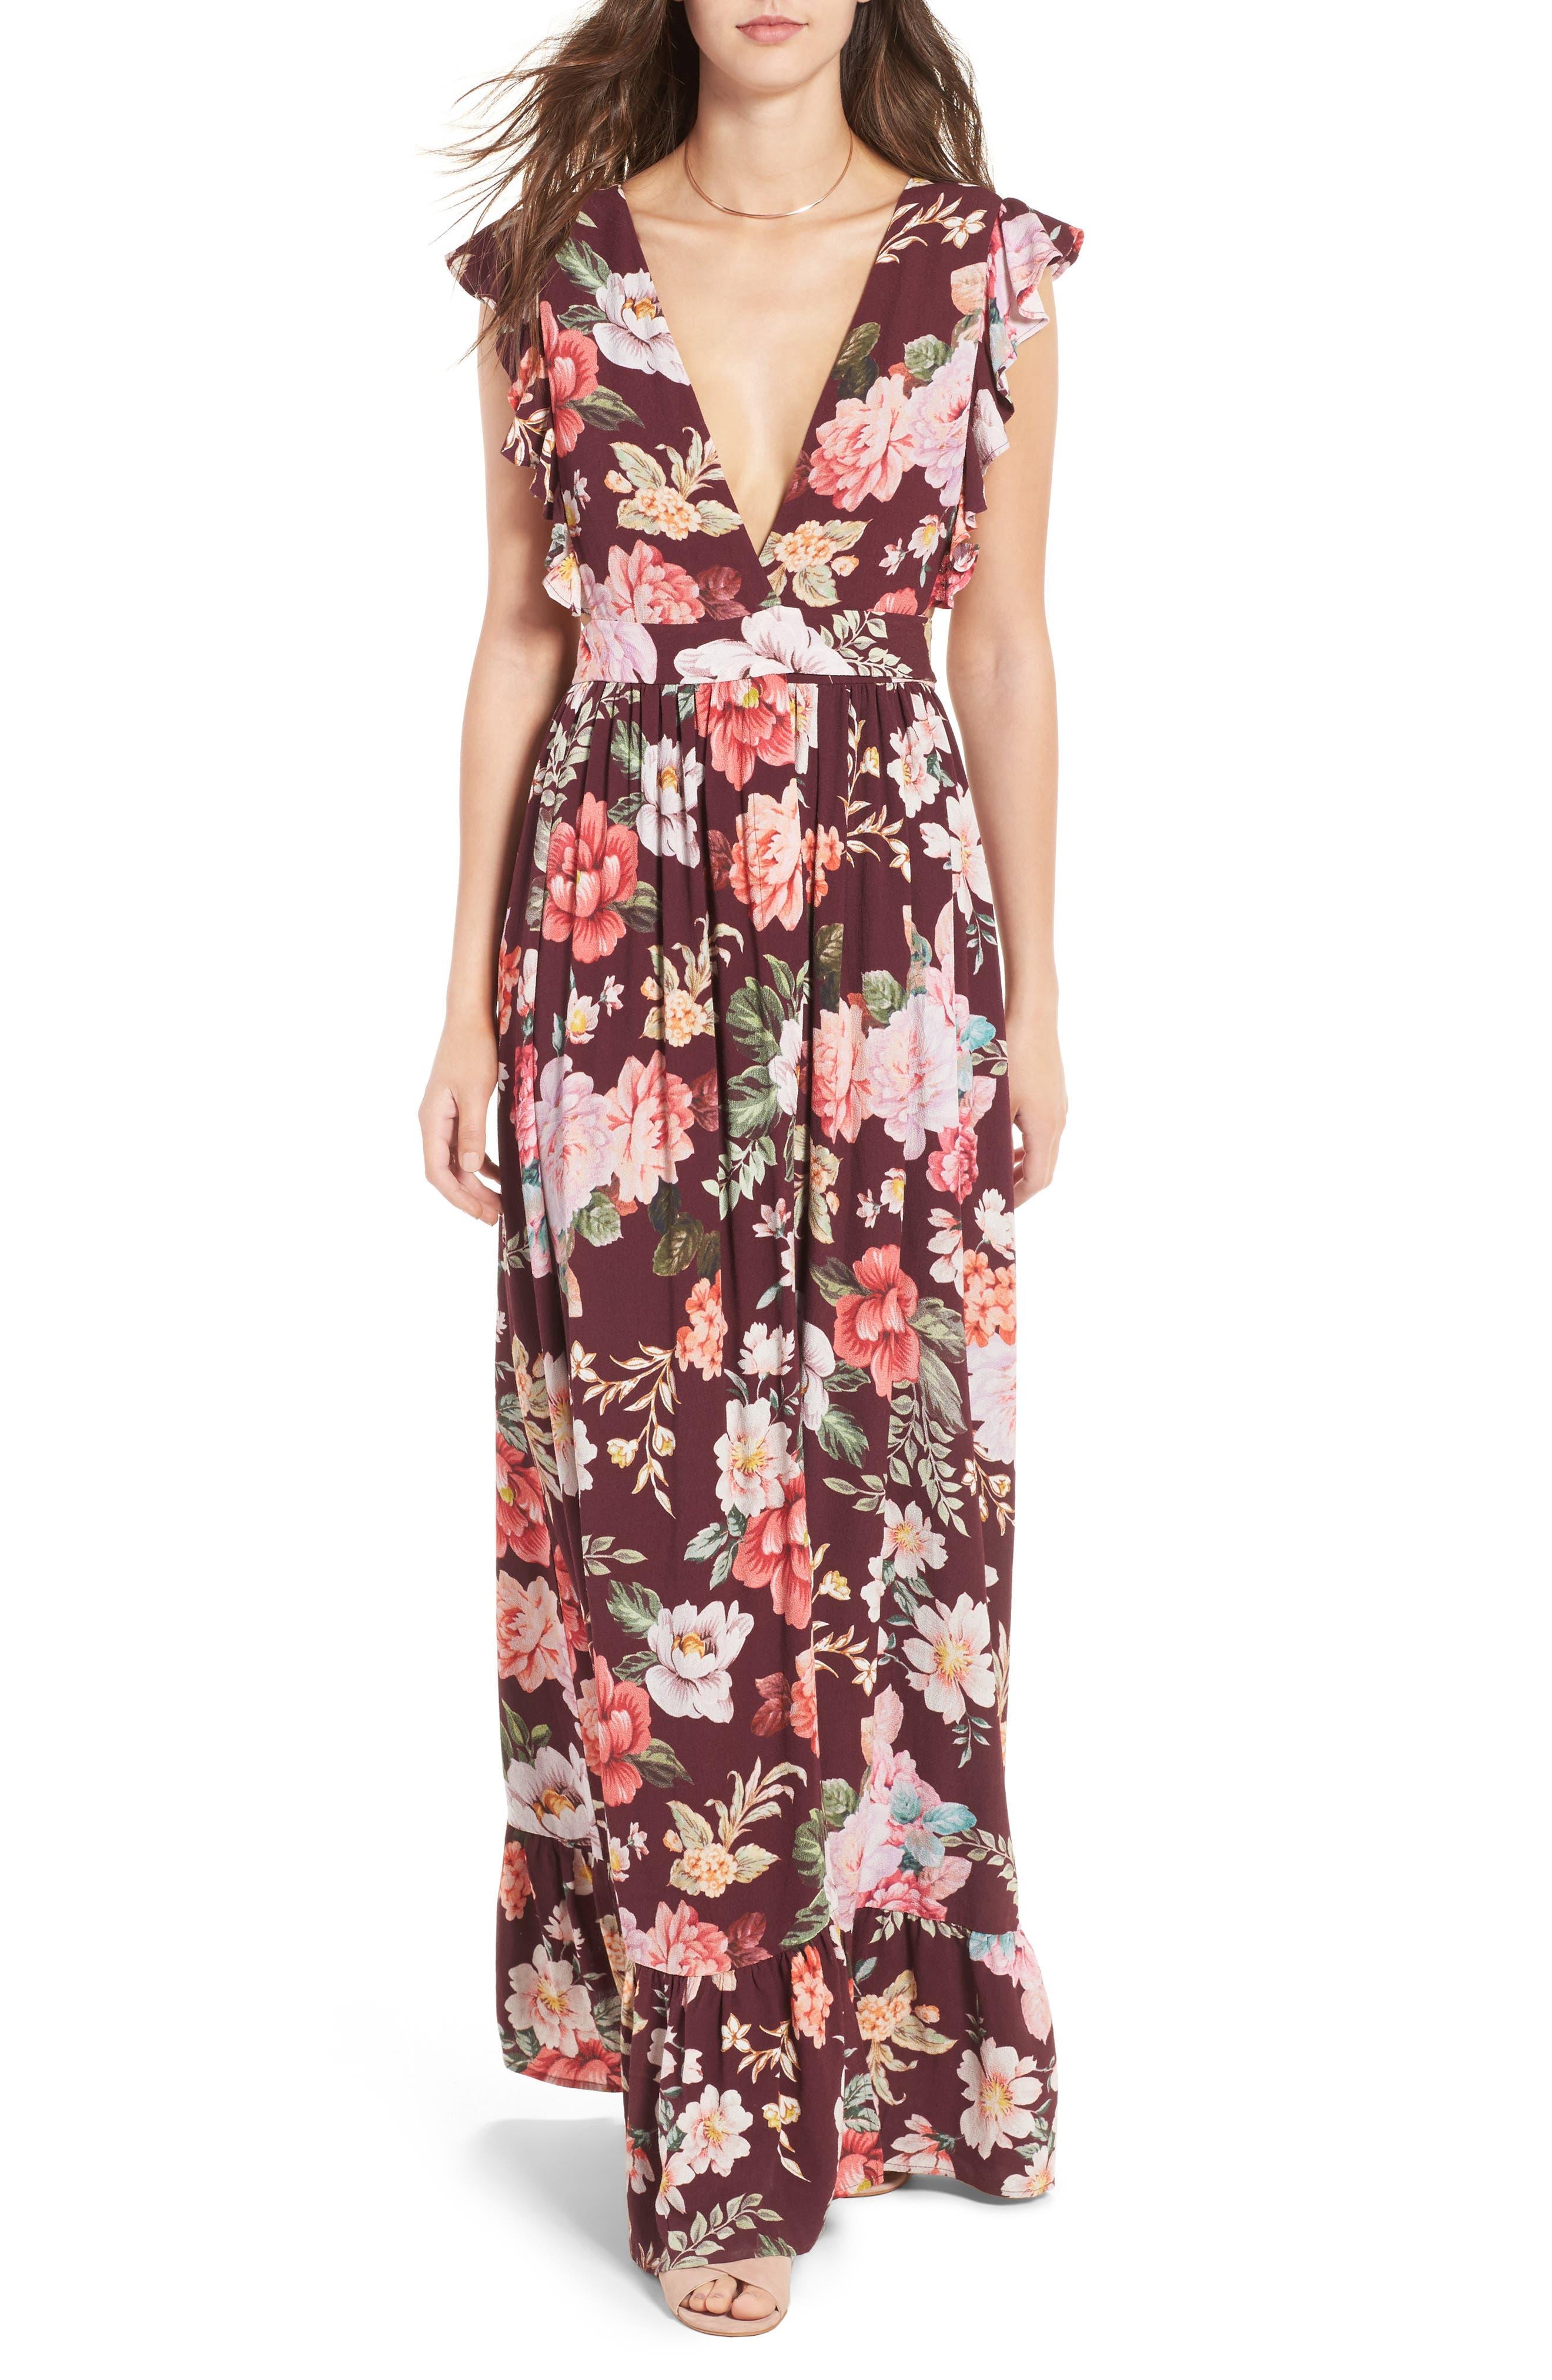 MAJORELLE Sweet Pea Maxi Dress, Main, color, 003